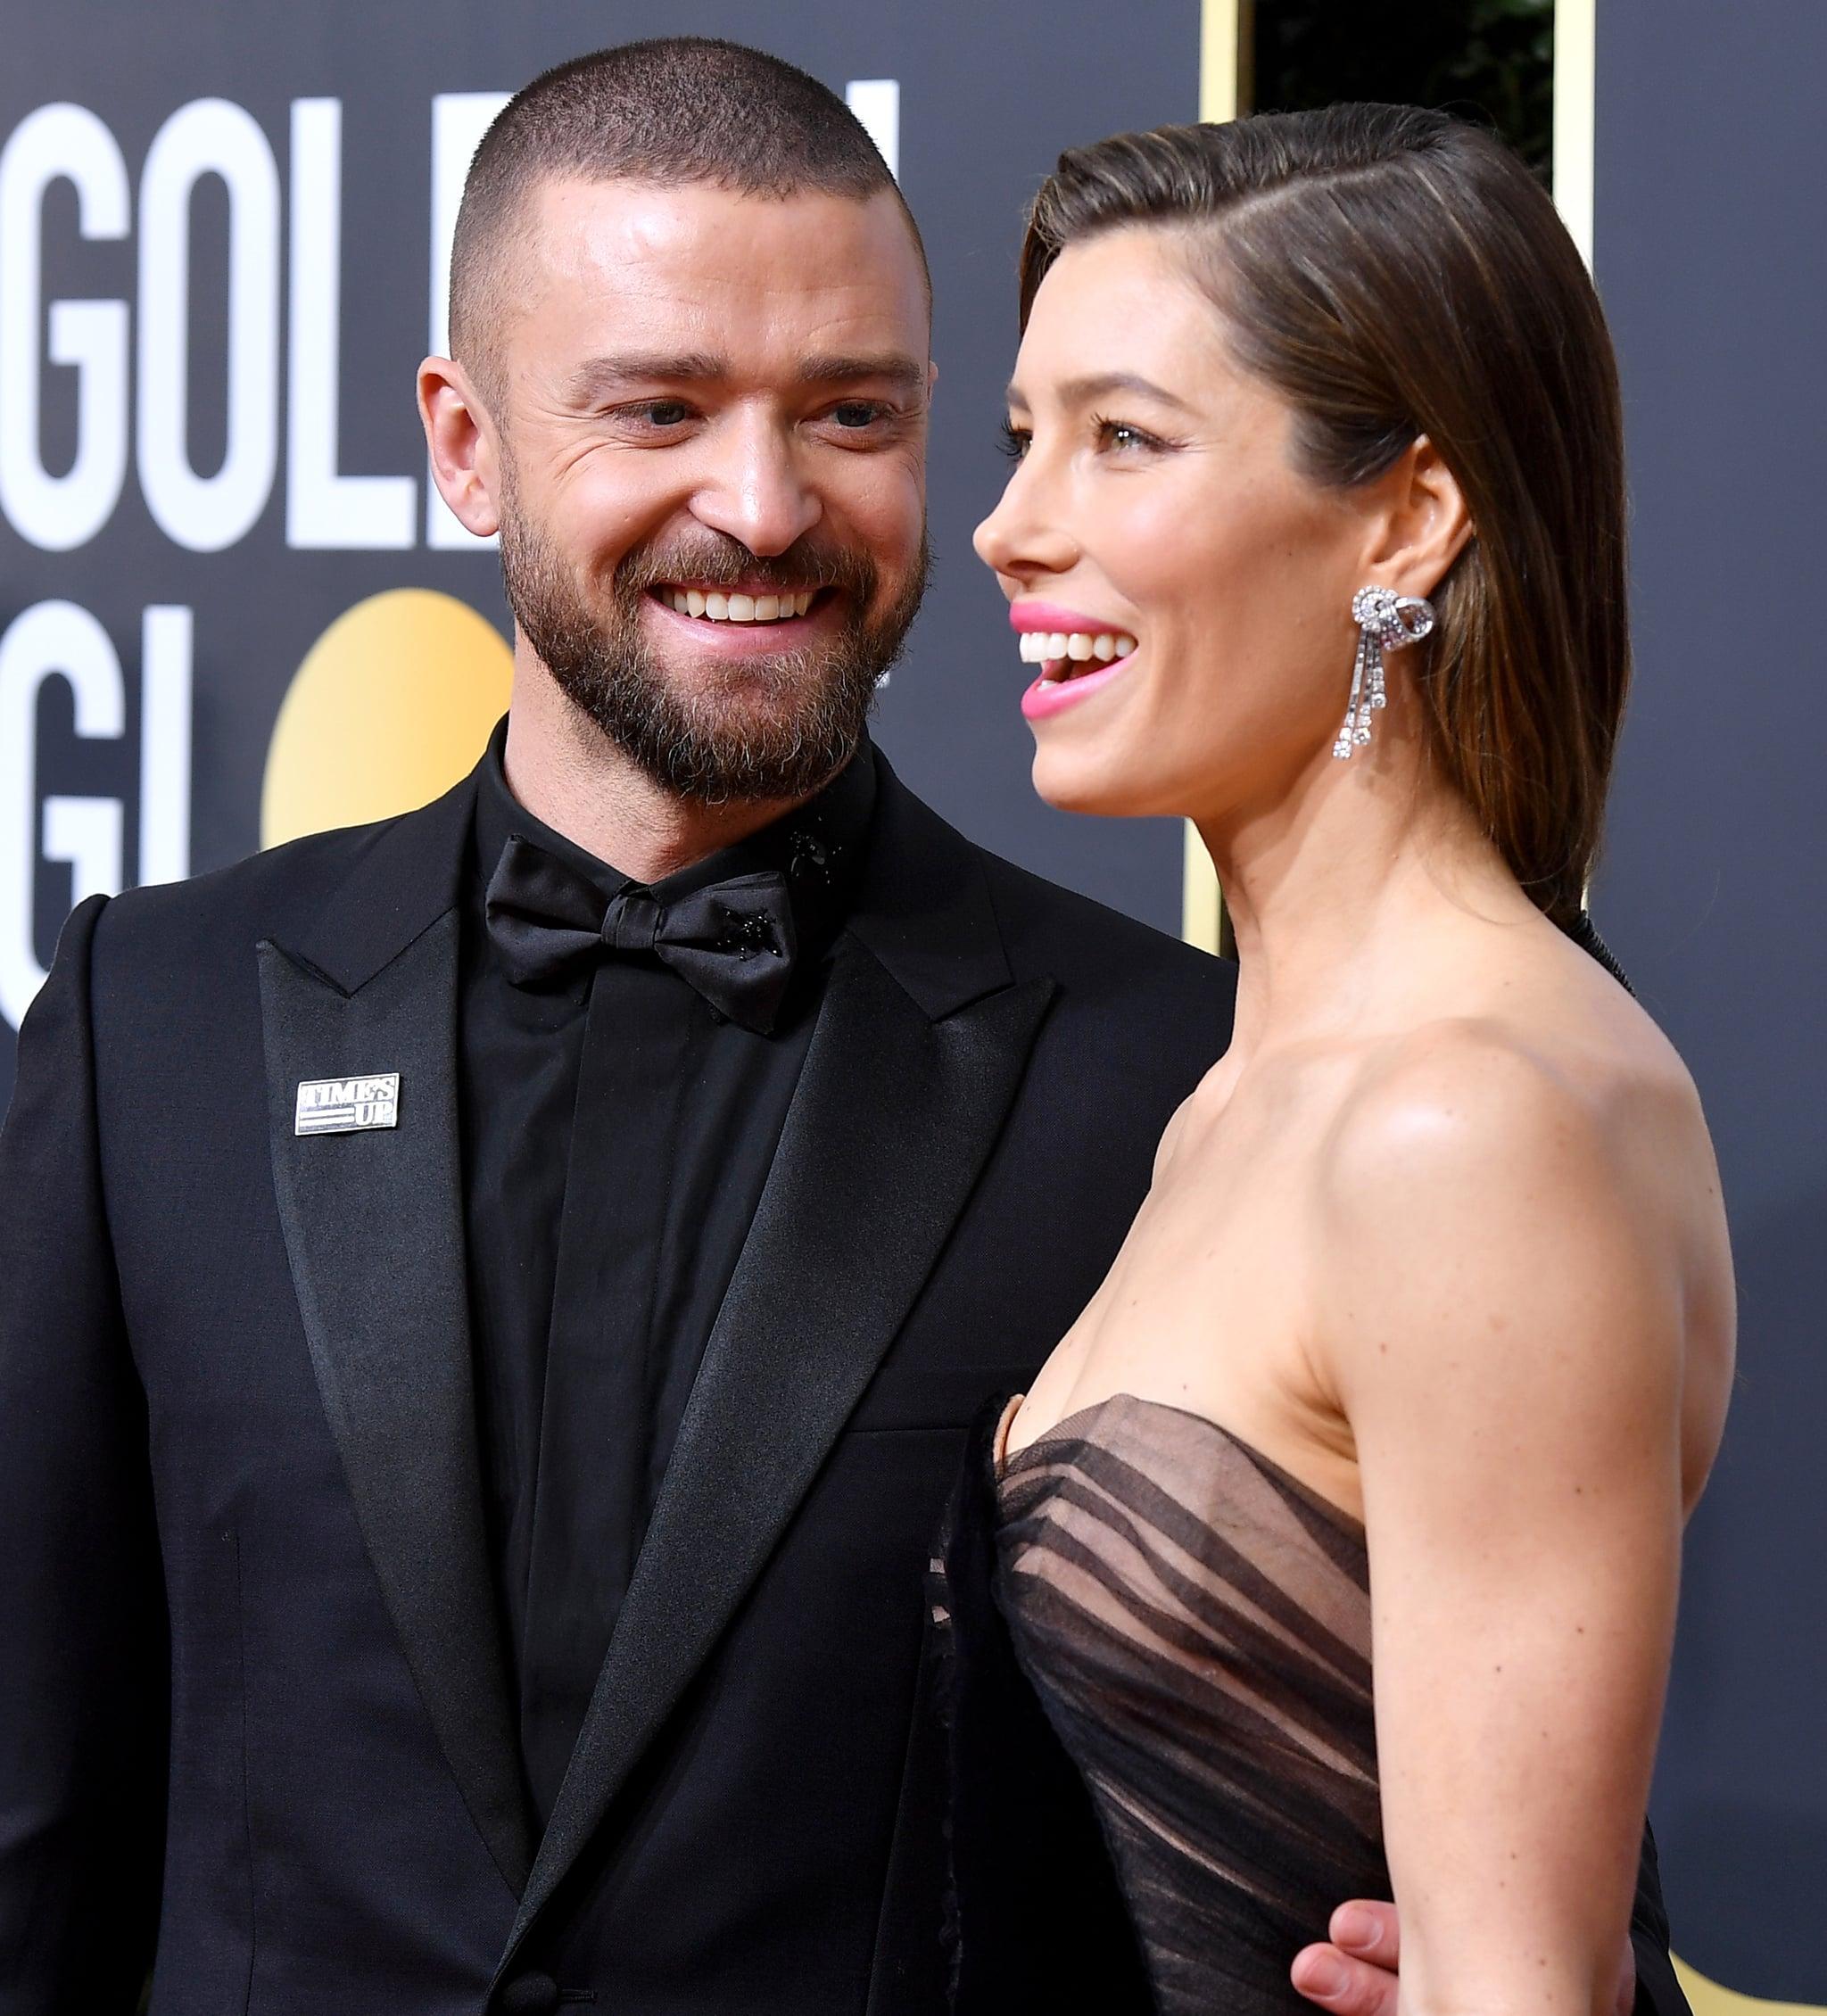 How Did Justin Timberlake Propose To Jessica Biel